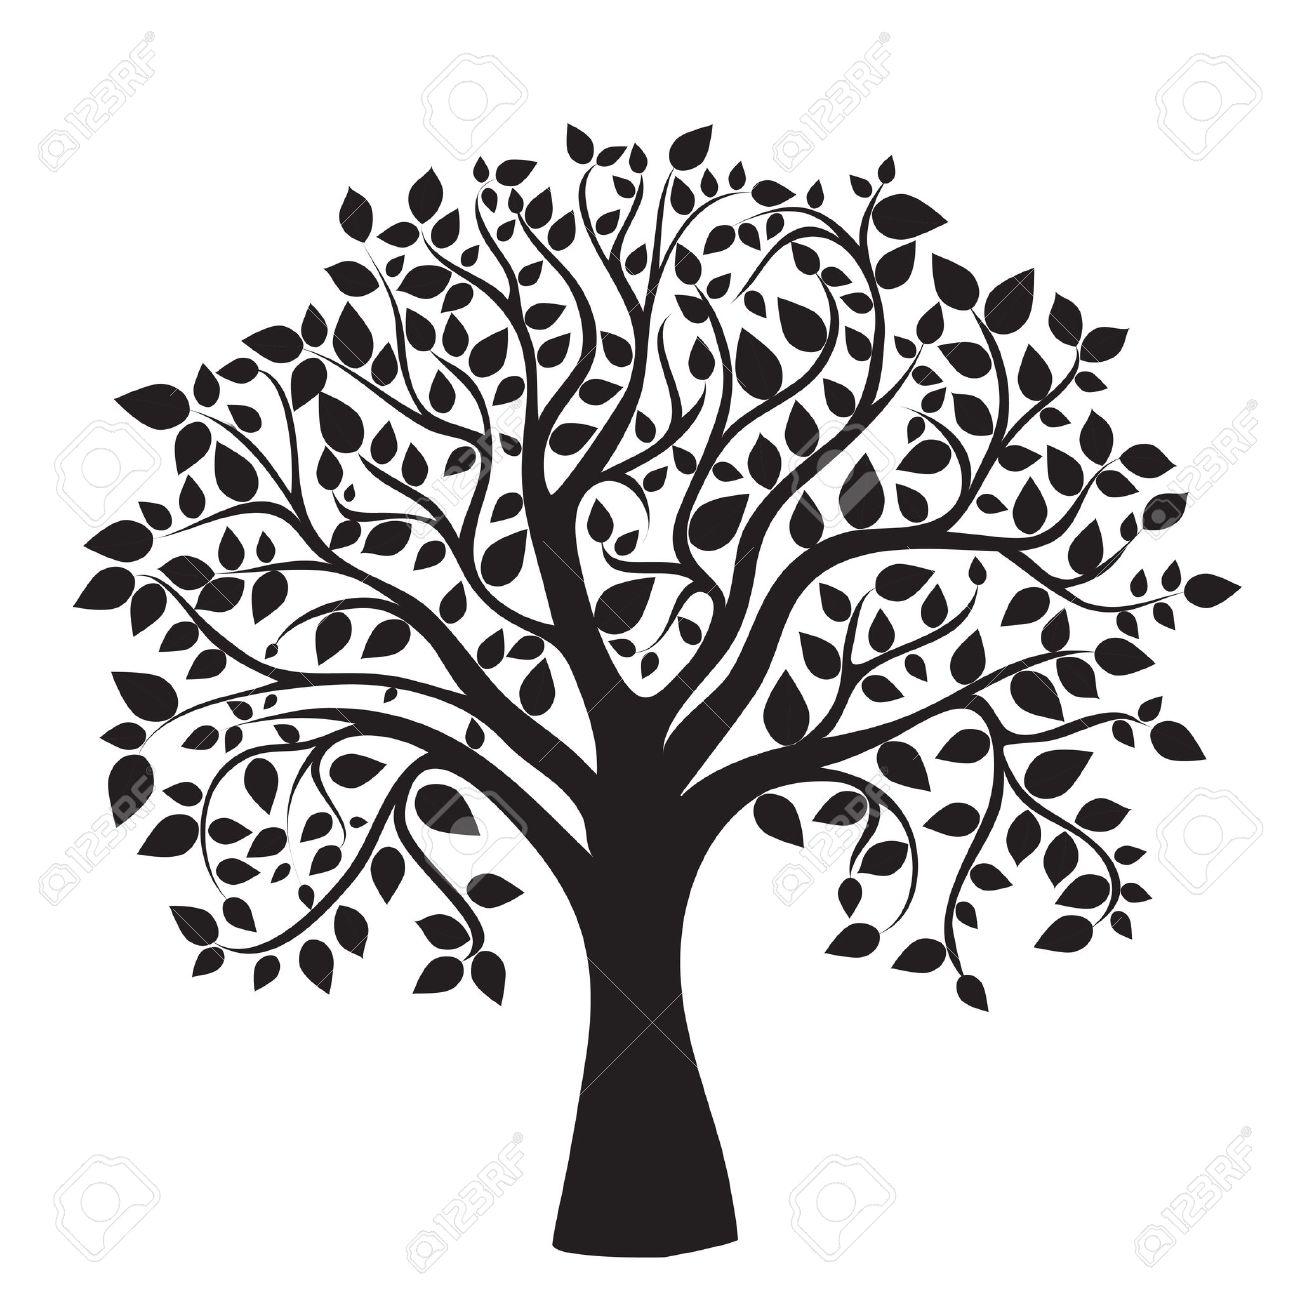 Silueta De árbol Negro Sobre Fondo Blanco Vector Fotos Retratos